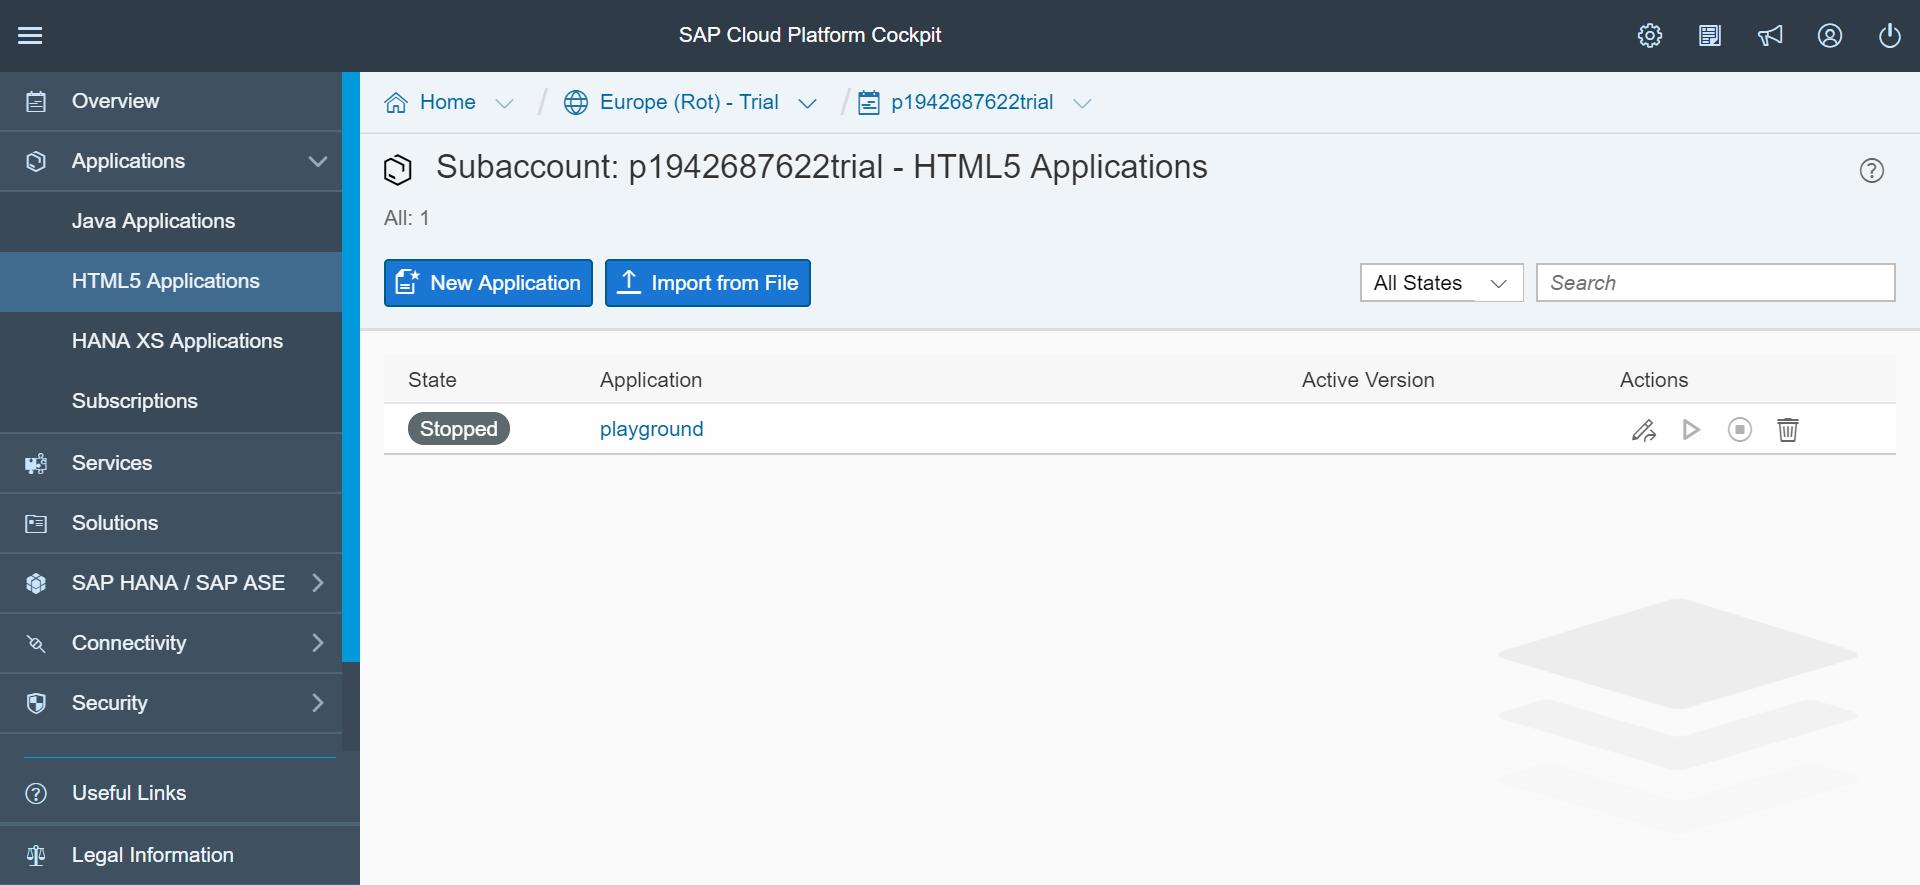 SAP Web IDE cockpit screenshot, showing the dashboard